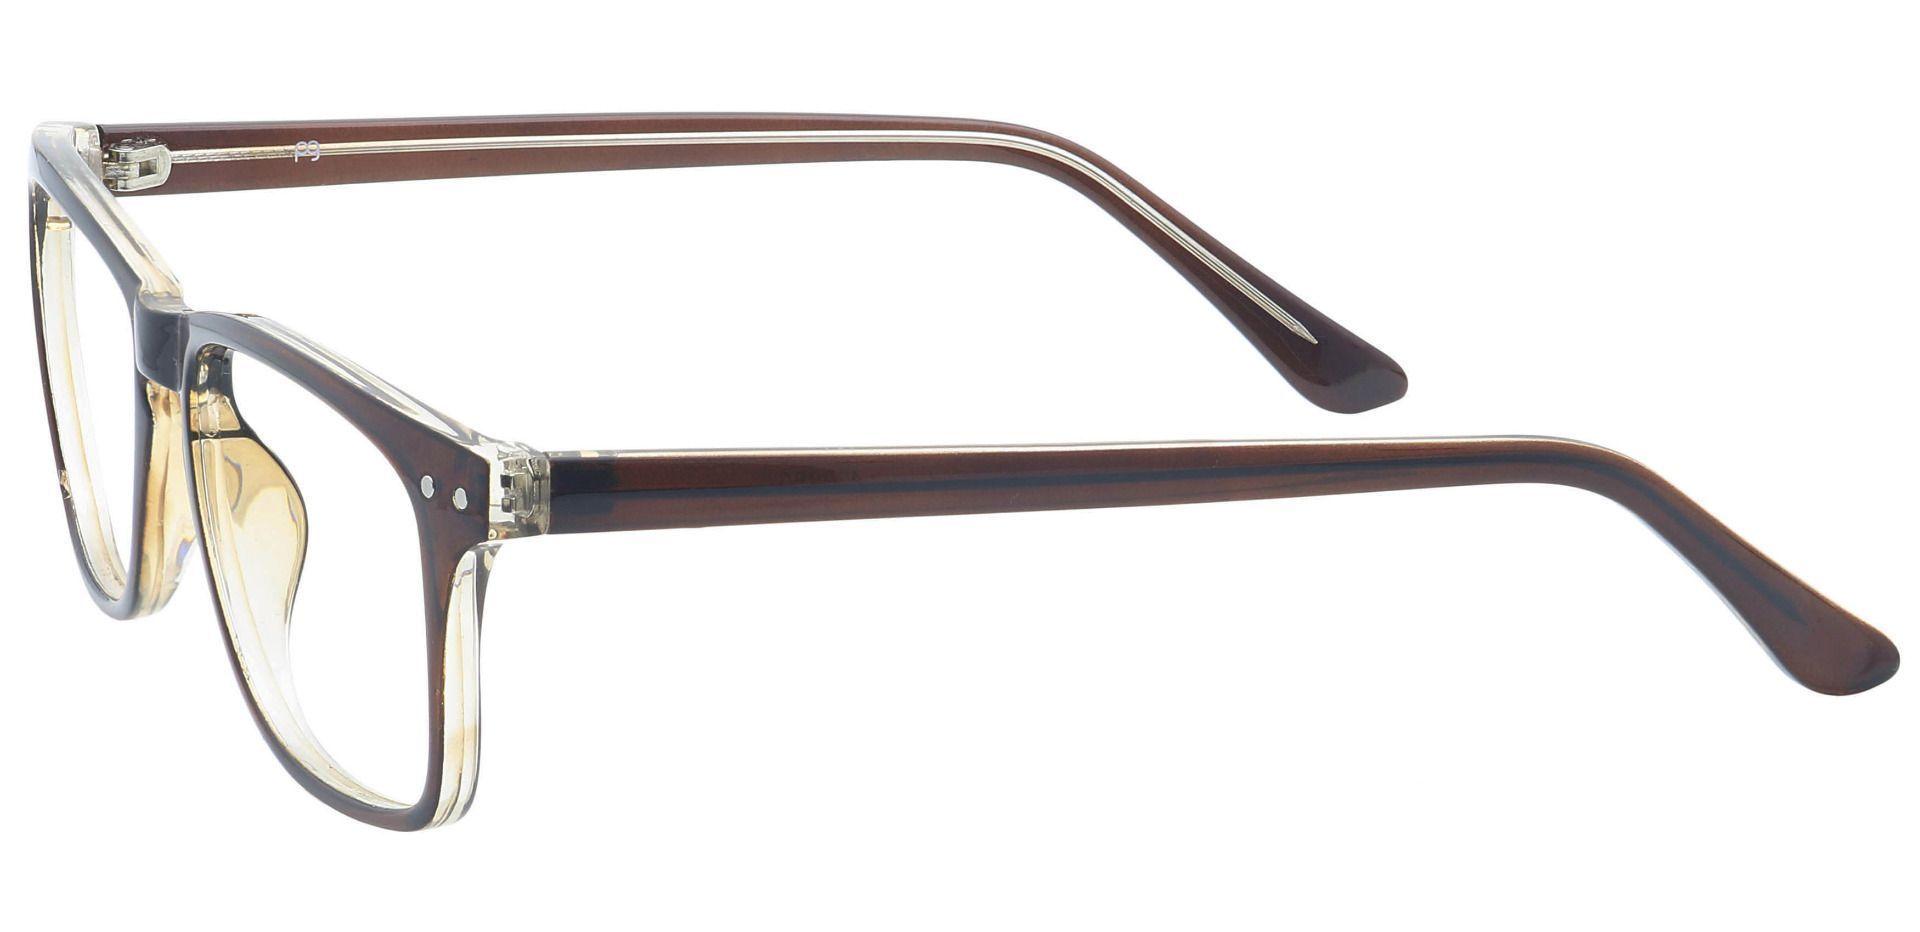 Hope Oval Prescription Glasses - Brown